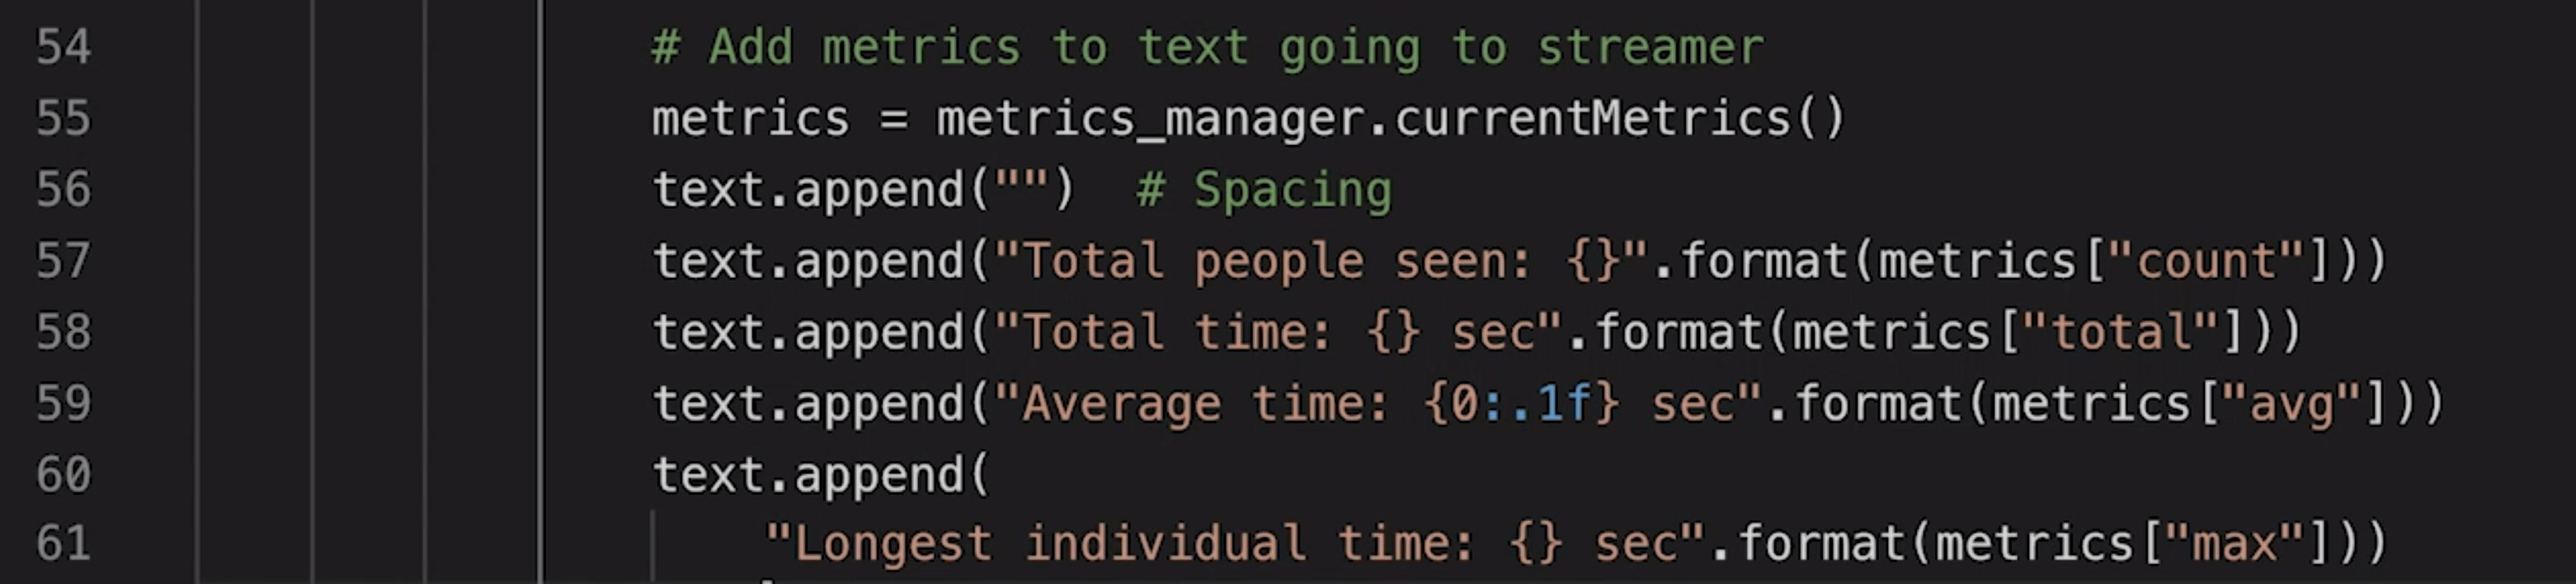 screenshot computer vision metrics text